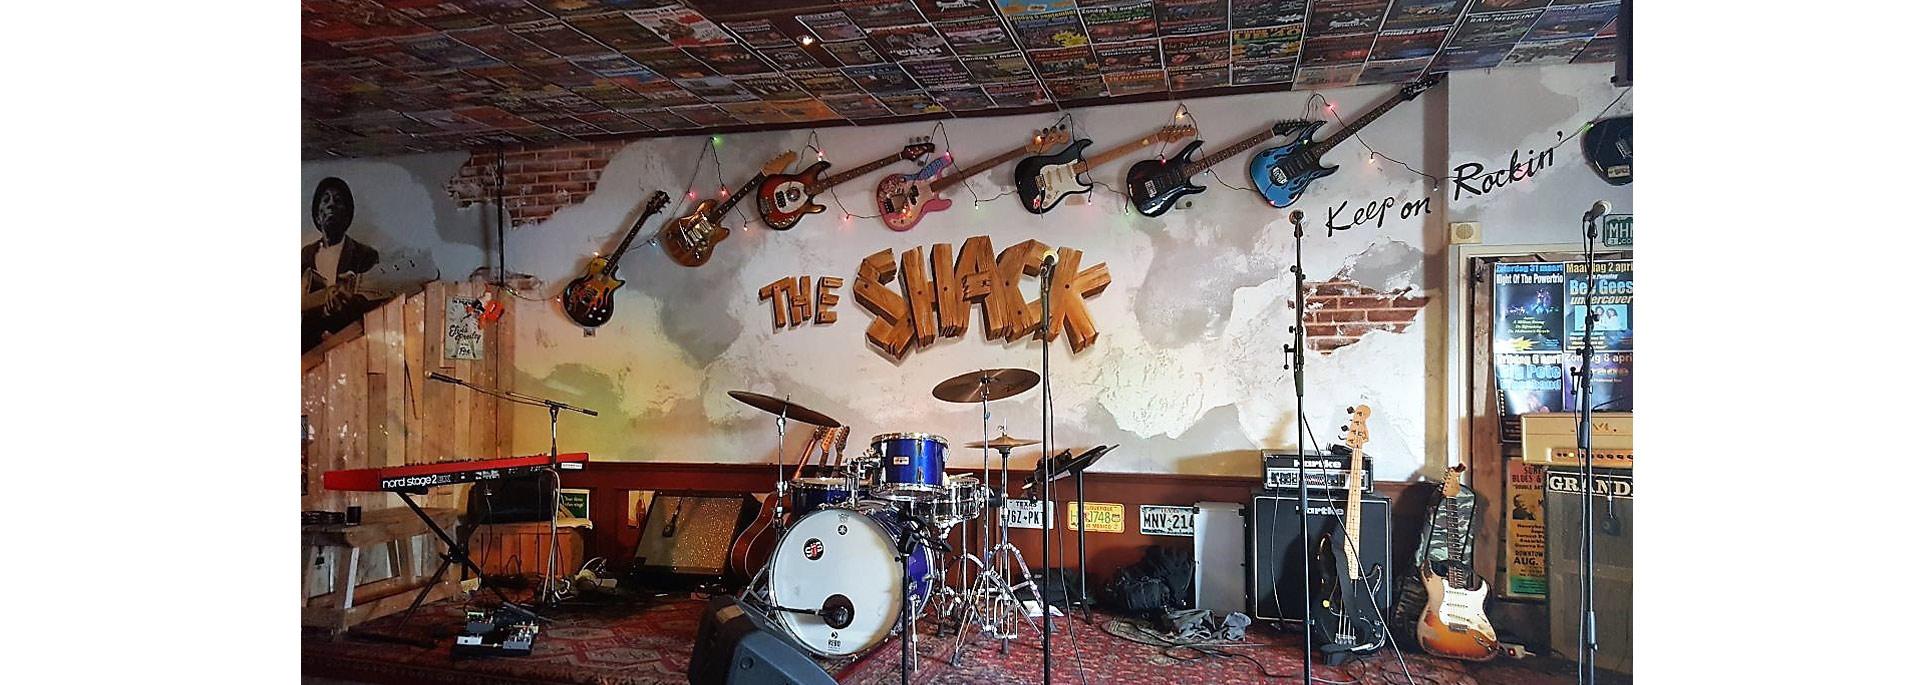 the shack guitarpoll